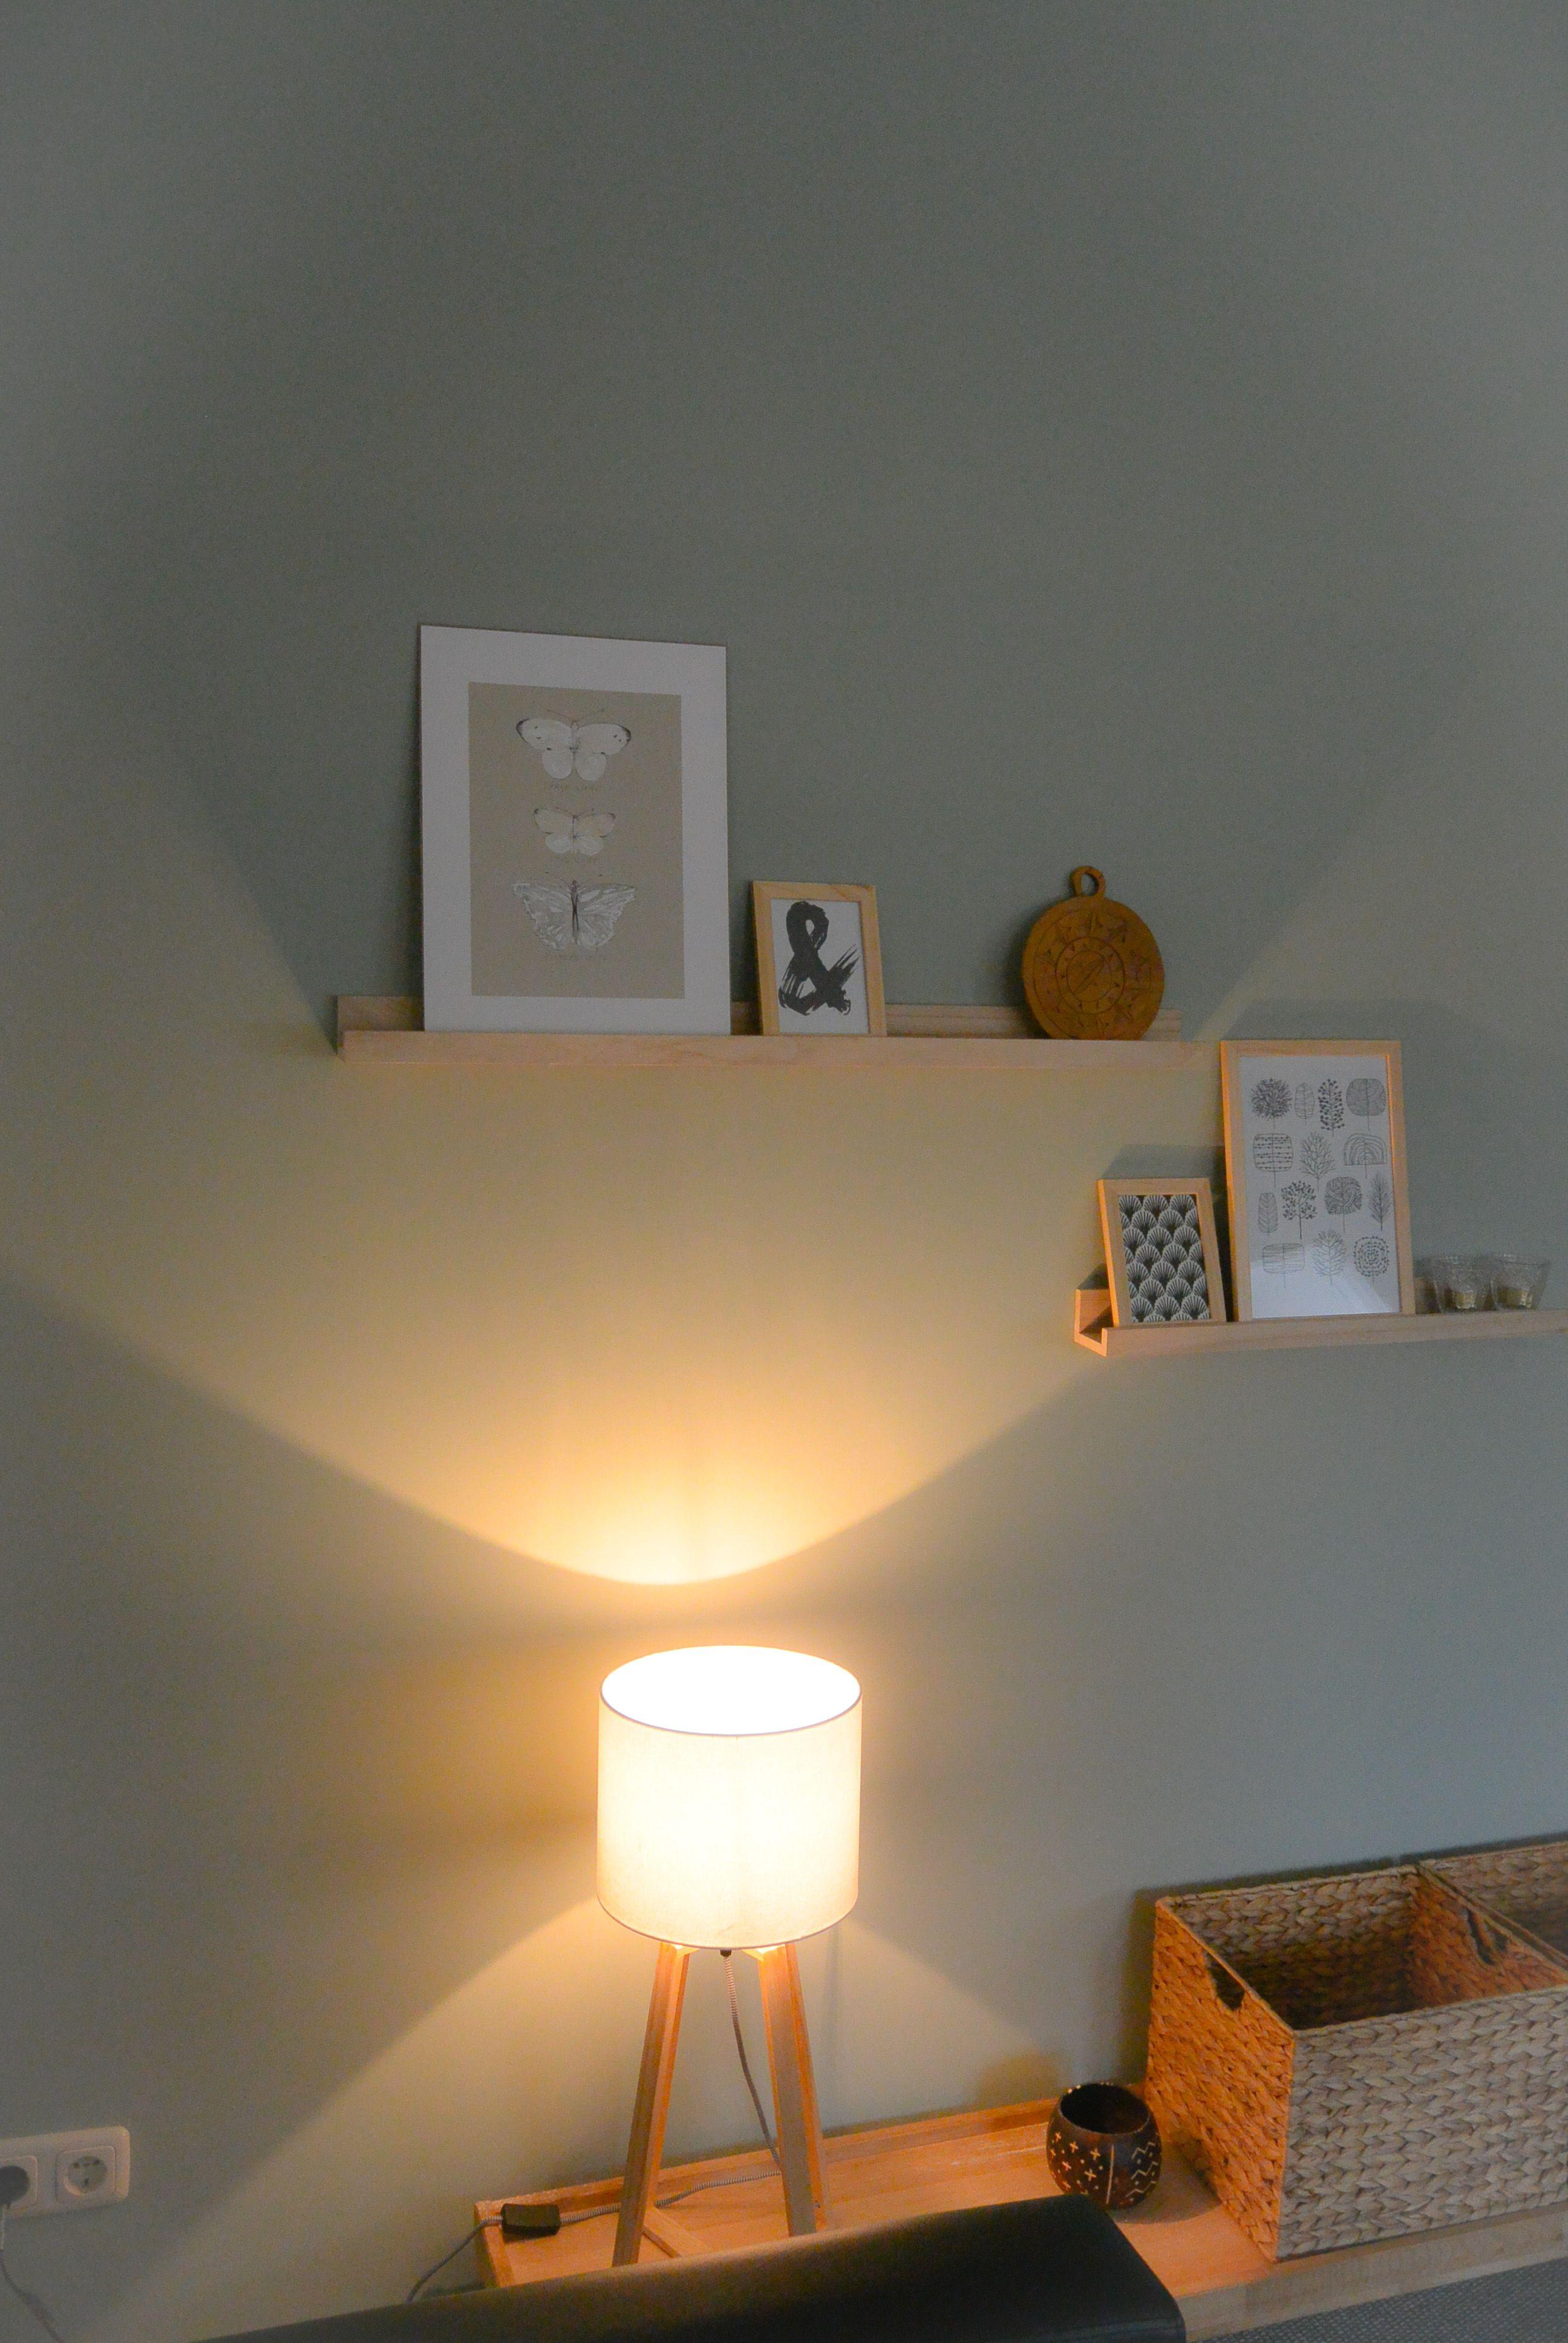 Appartement 1 lamp en plankjes xenos manden jysk - Appartement ikea ...